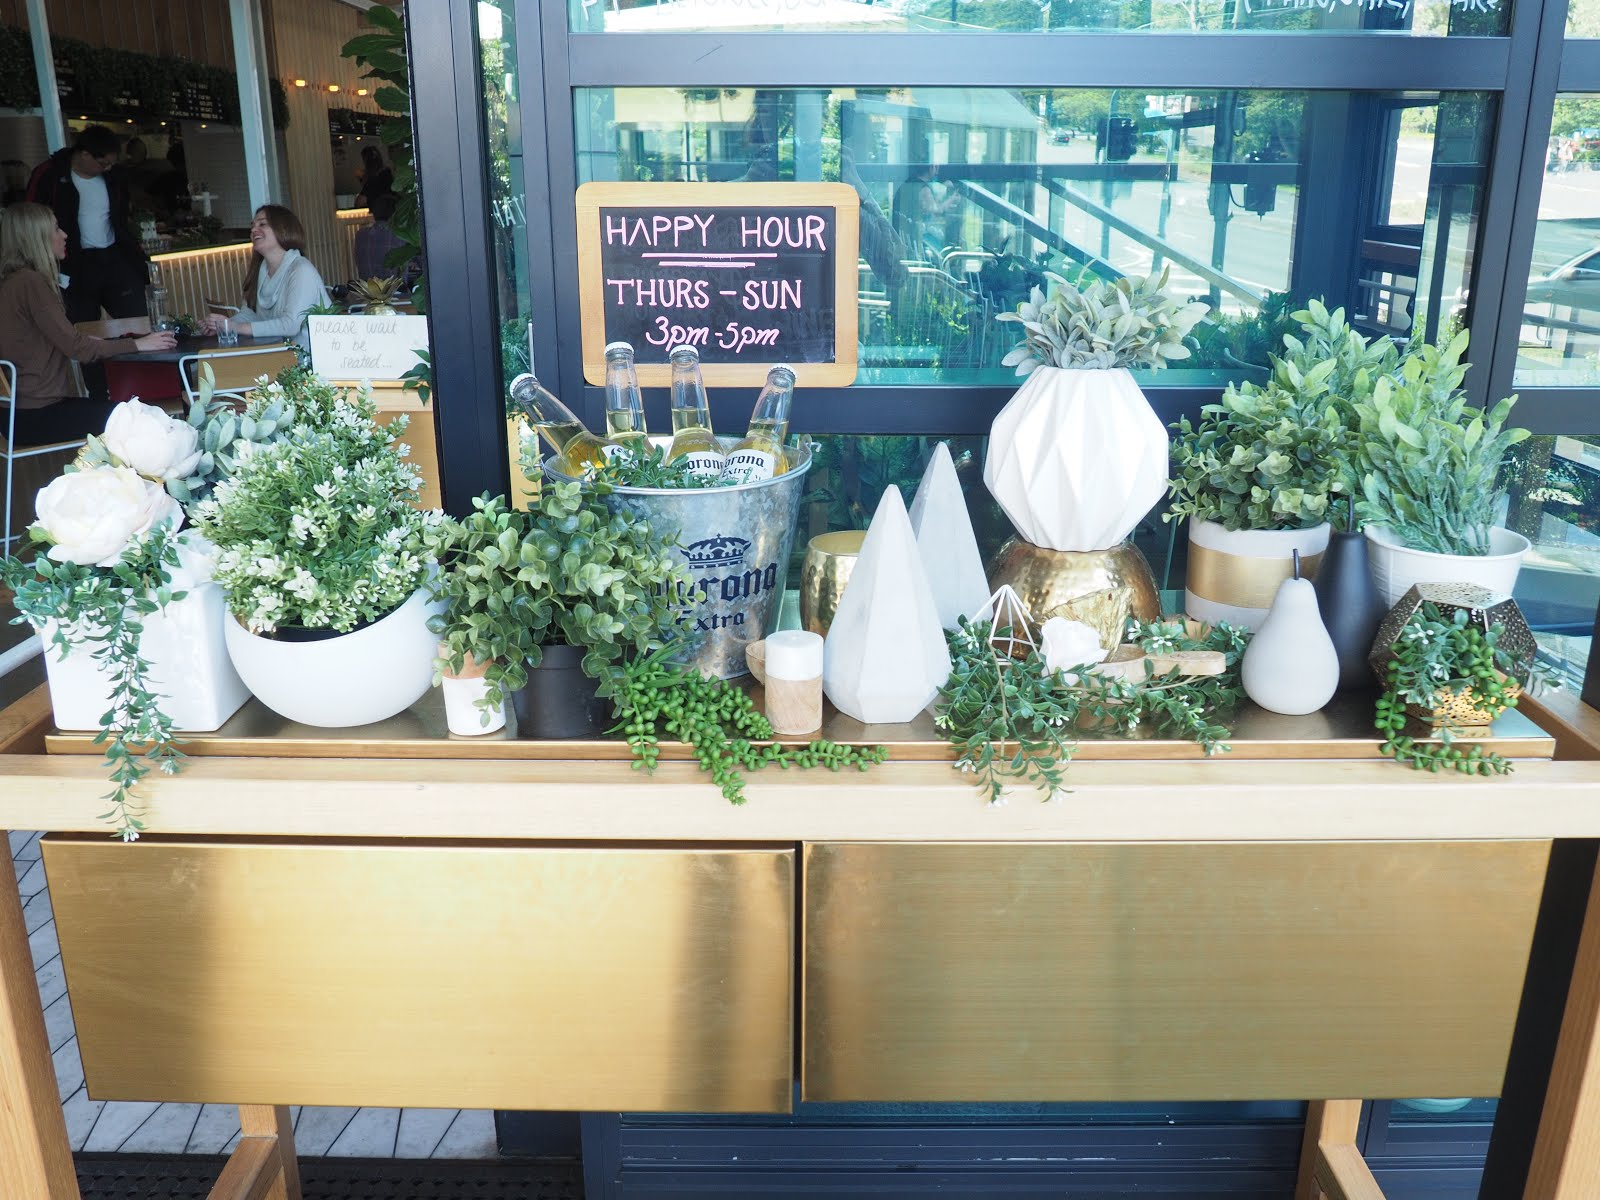 HATTRICK - The Best Bar & Restaurant in MQ | hkblogger